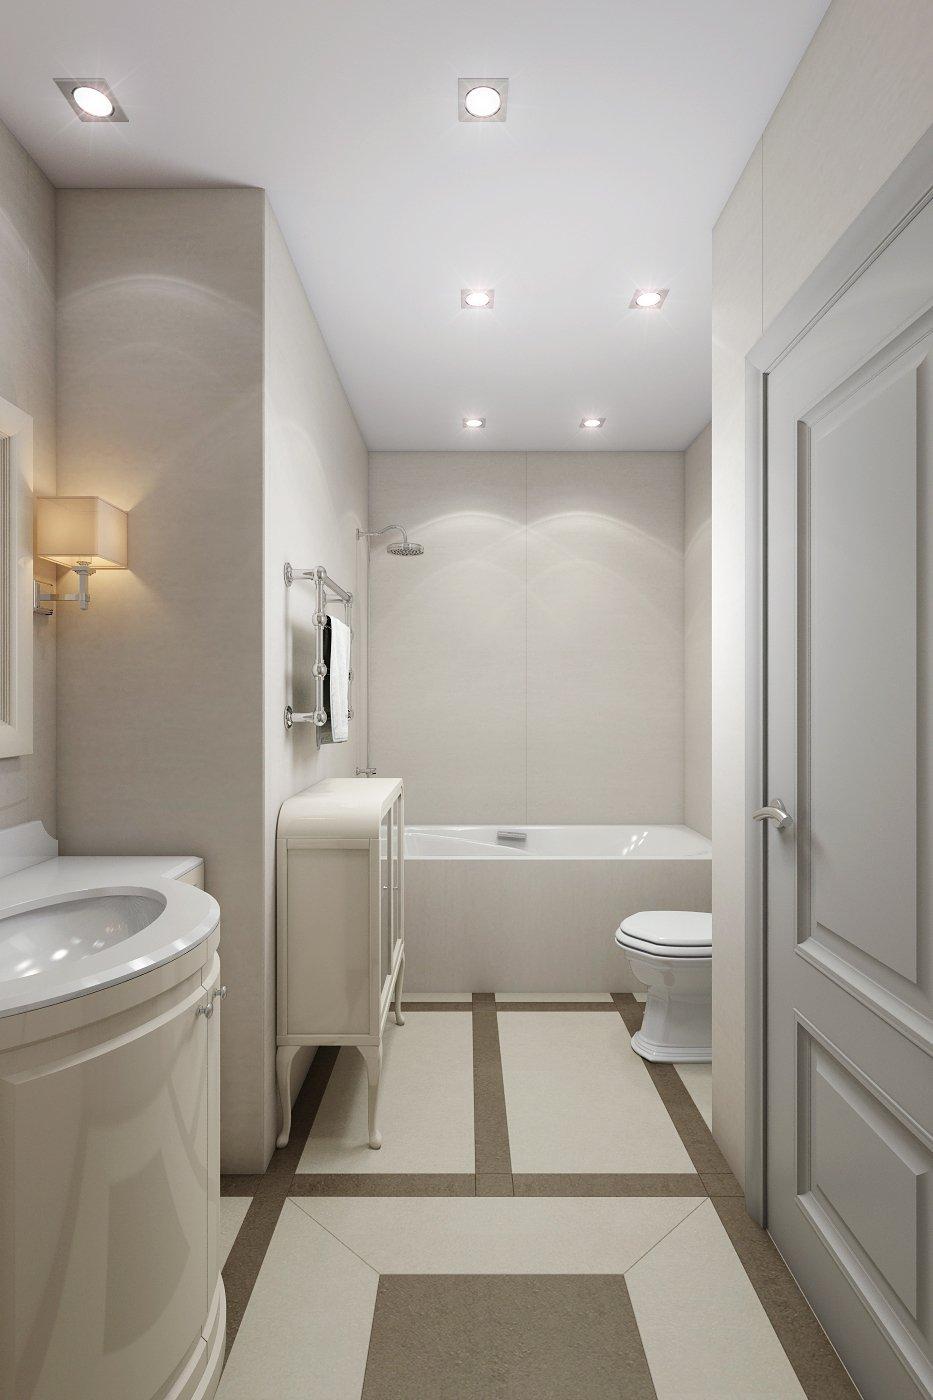 Фотография: Ванная в стиле Эклектика, Квартира, Дома и квартиры, Проект недели – фото на INMYROOM